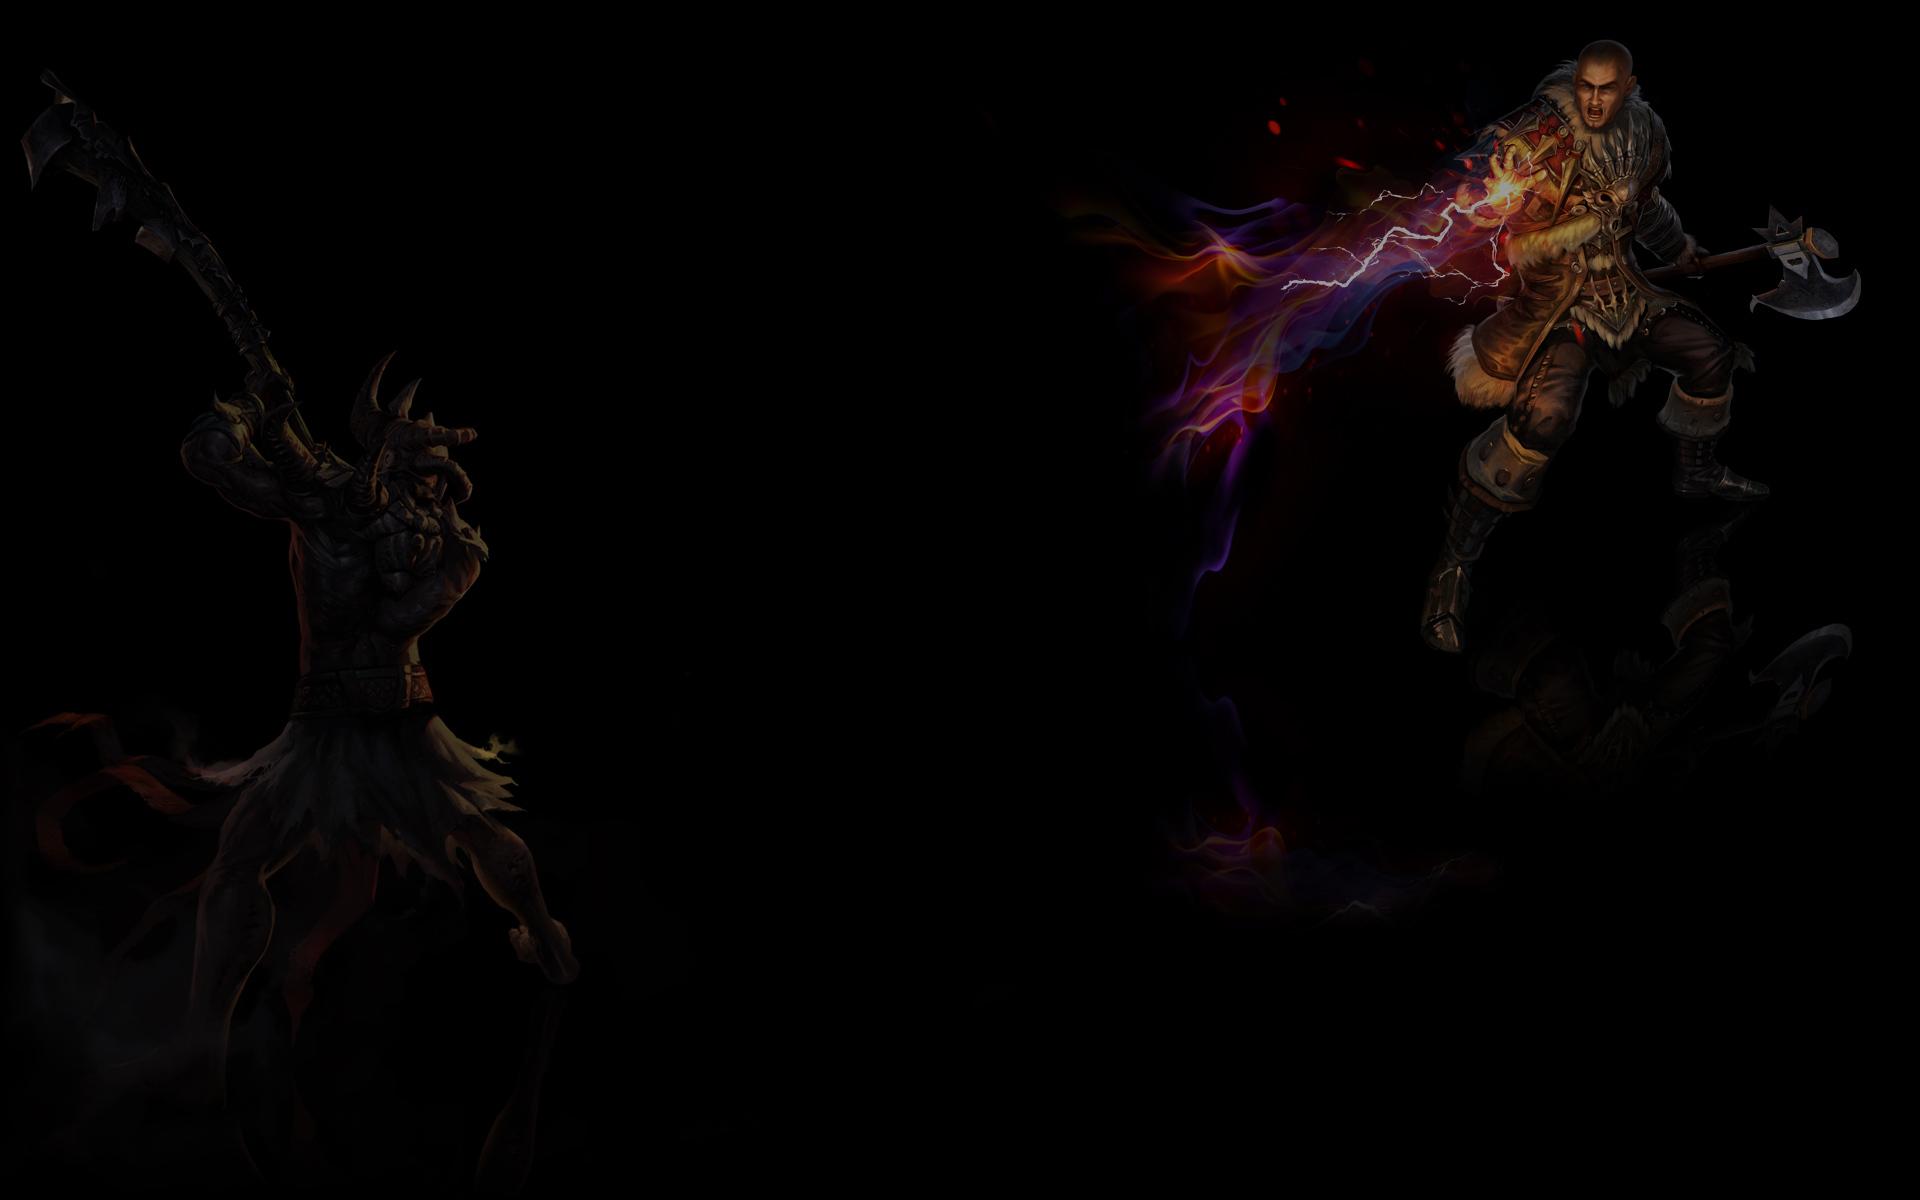 Image risen 3 titan lords background the demon hunterg risen 3 titan lords background the demon hunterg voltagebd Images